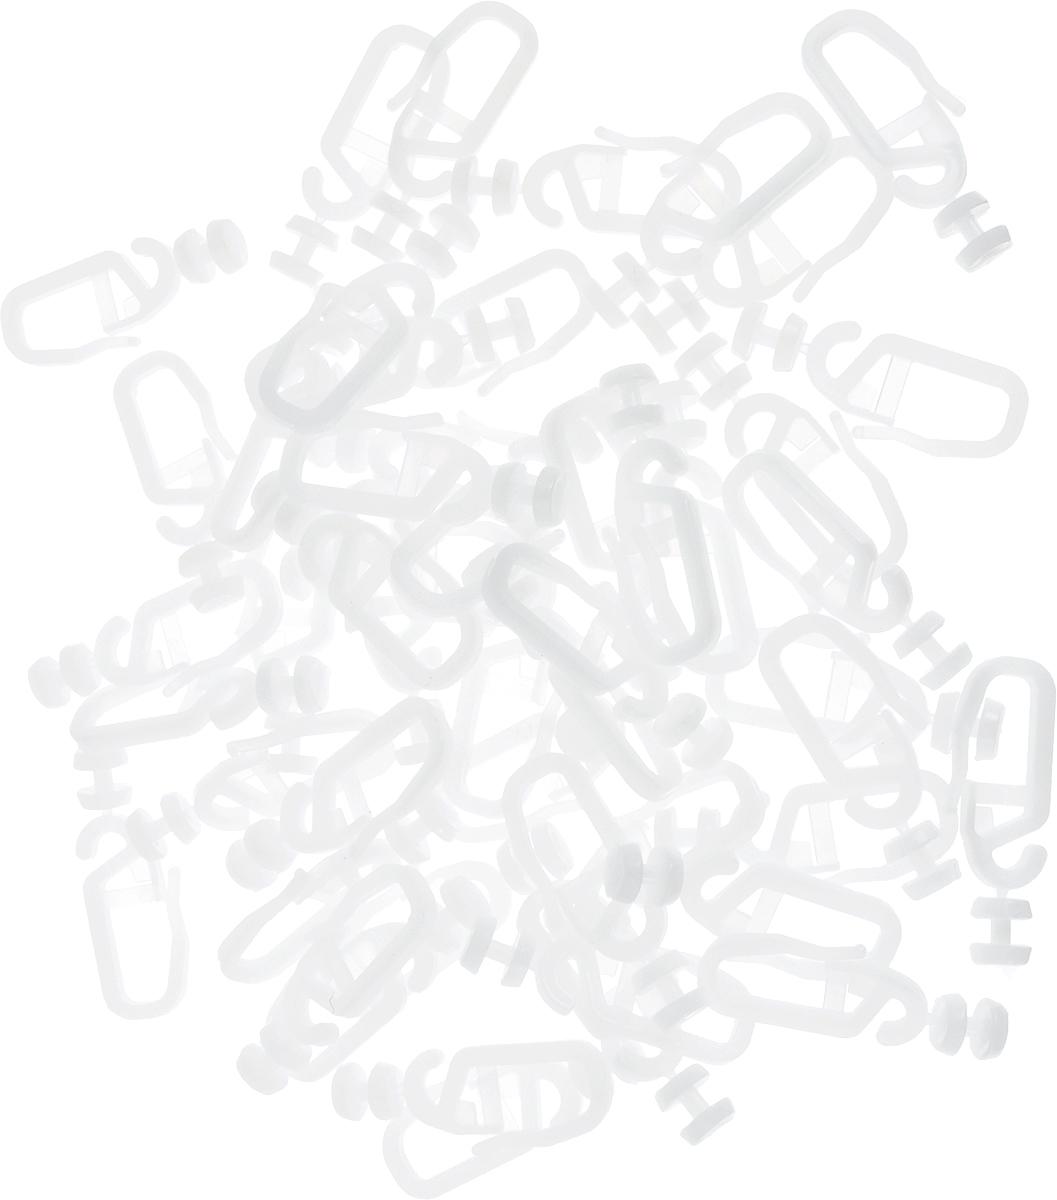 Крючок роликовый Эскар, для потолочной шины, 50 шт car styling refit accelerator oil footrest pedal plate clutch throttle brake treadle for bmw 5 5gt 6 7 series x3 x4 x5 x6 z4 lhd